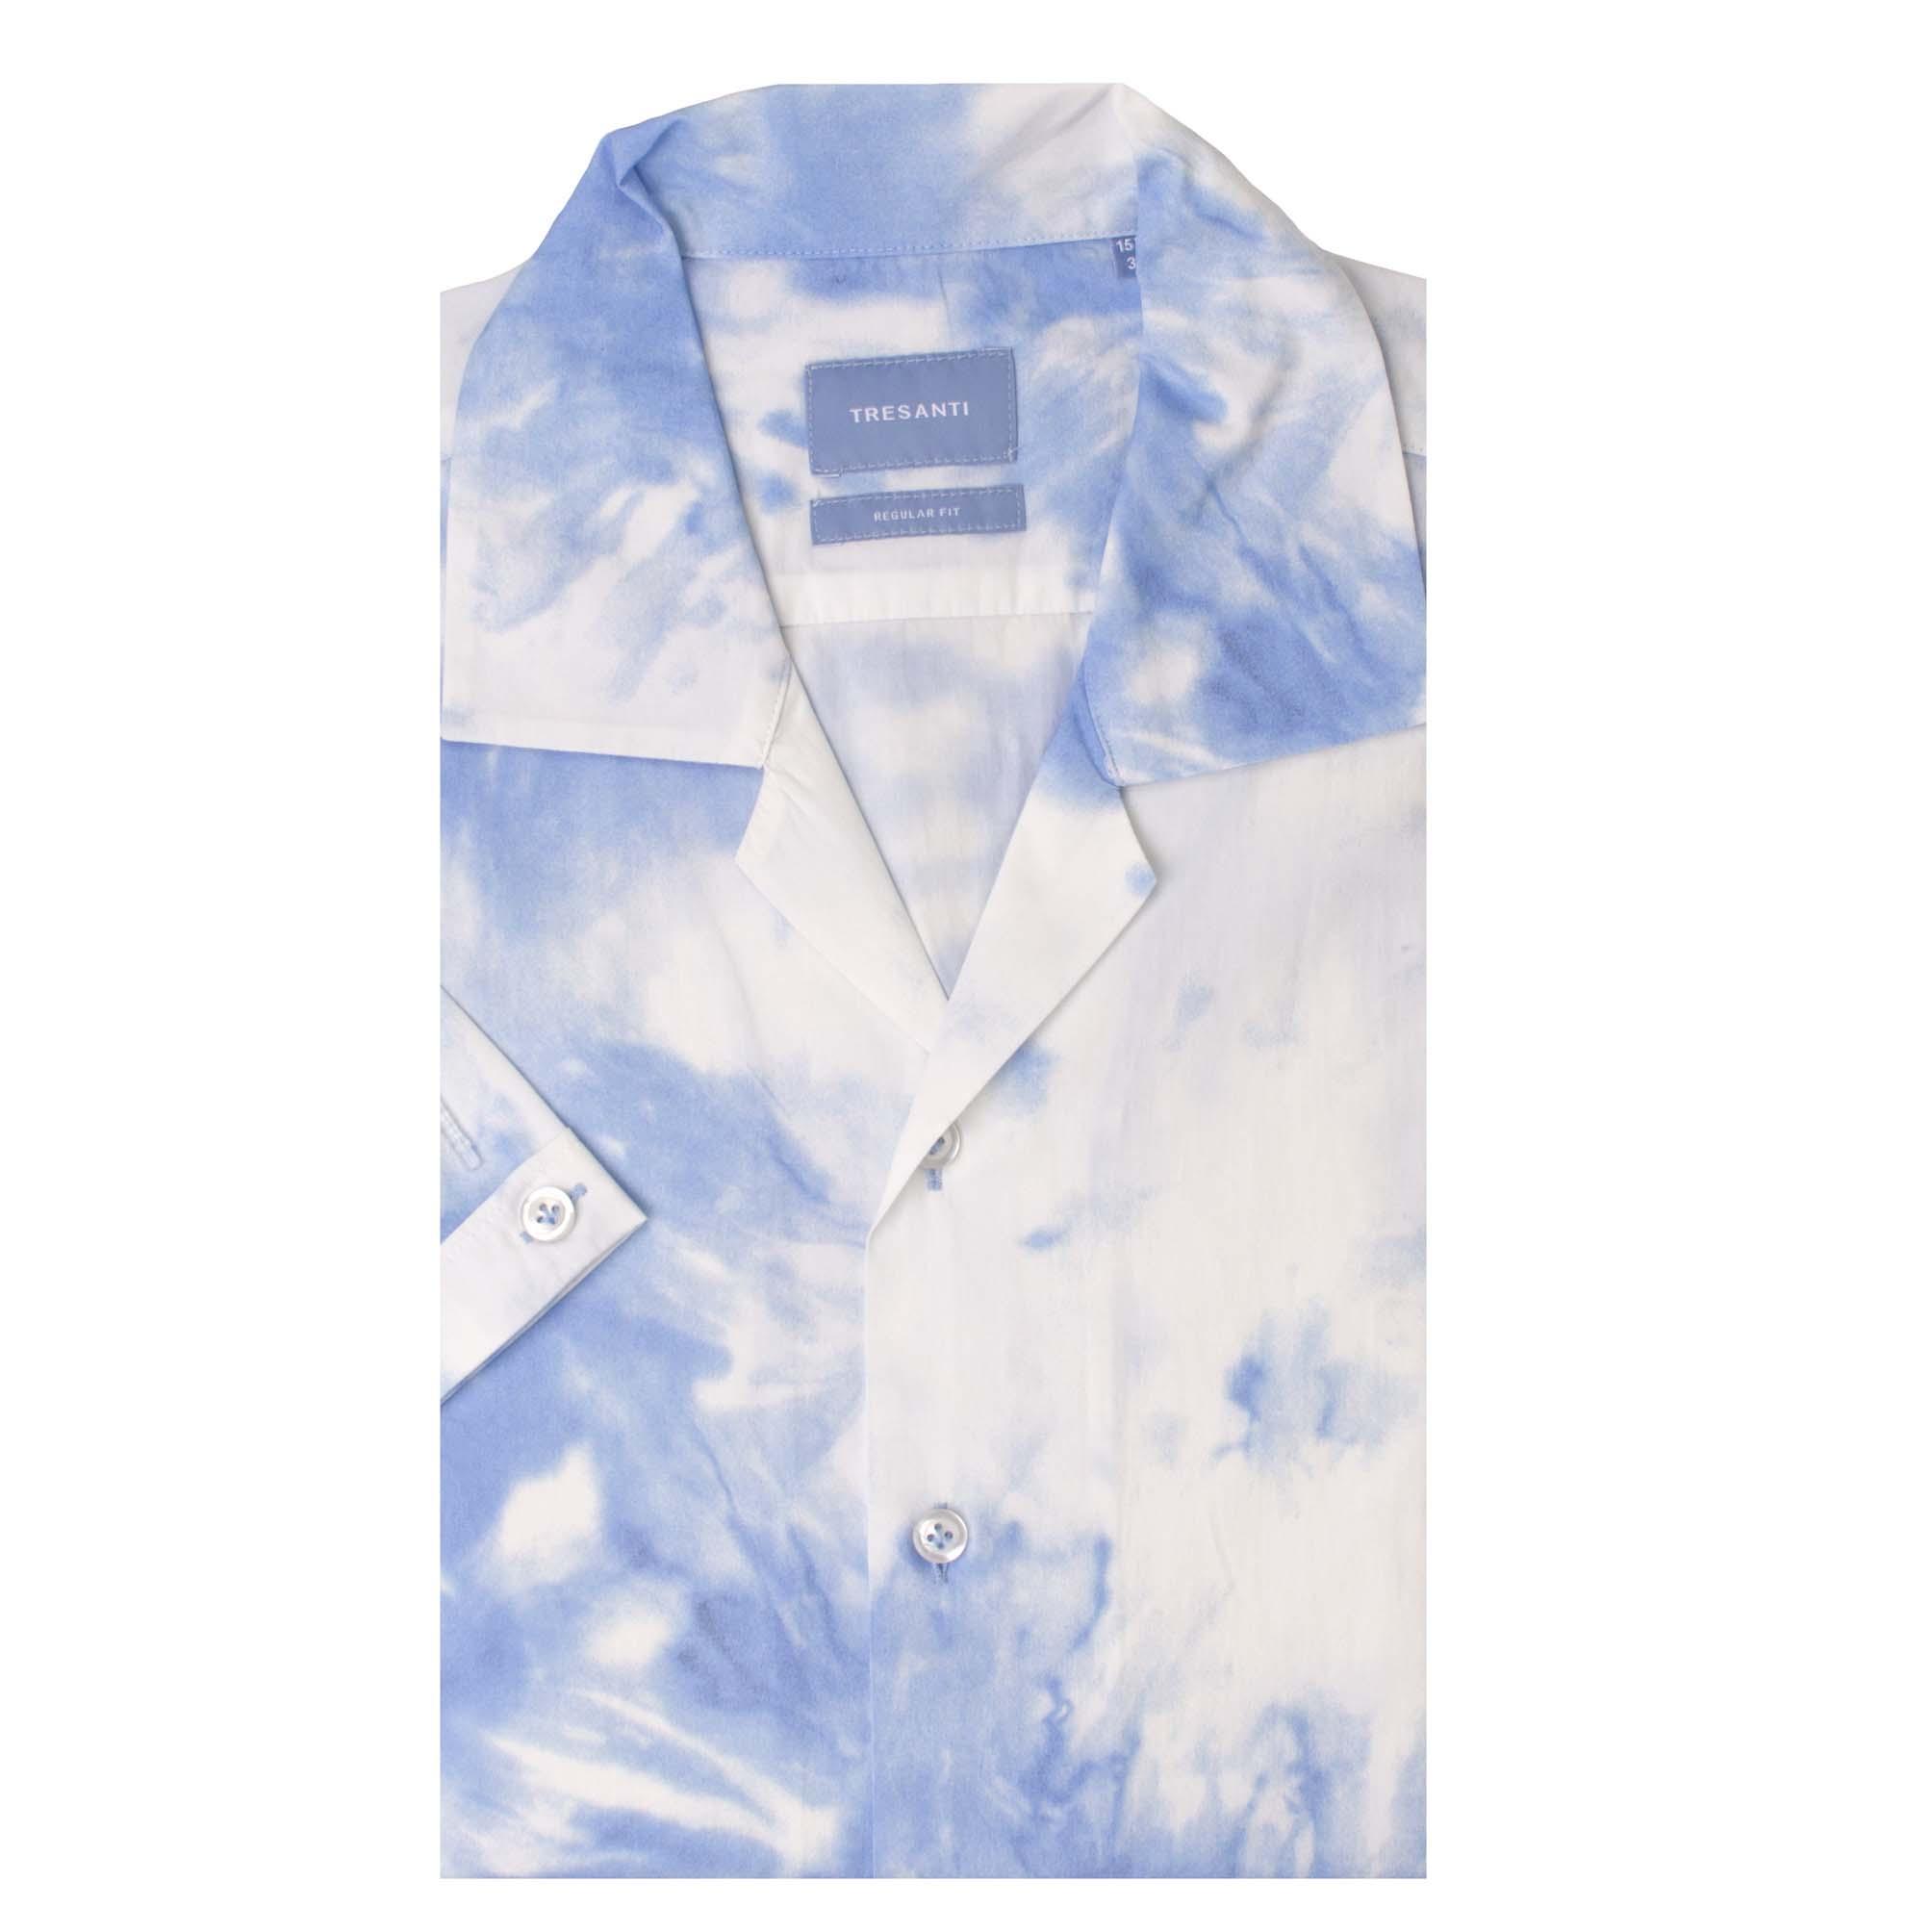 Tyrell   Shirt tie dye print blue   SS